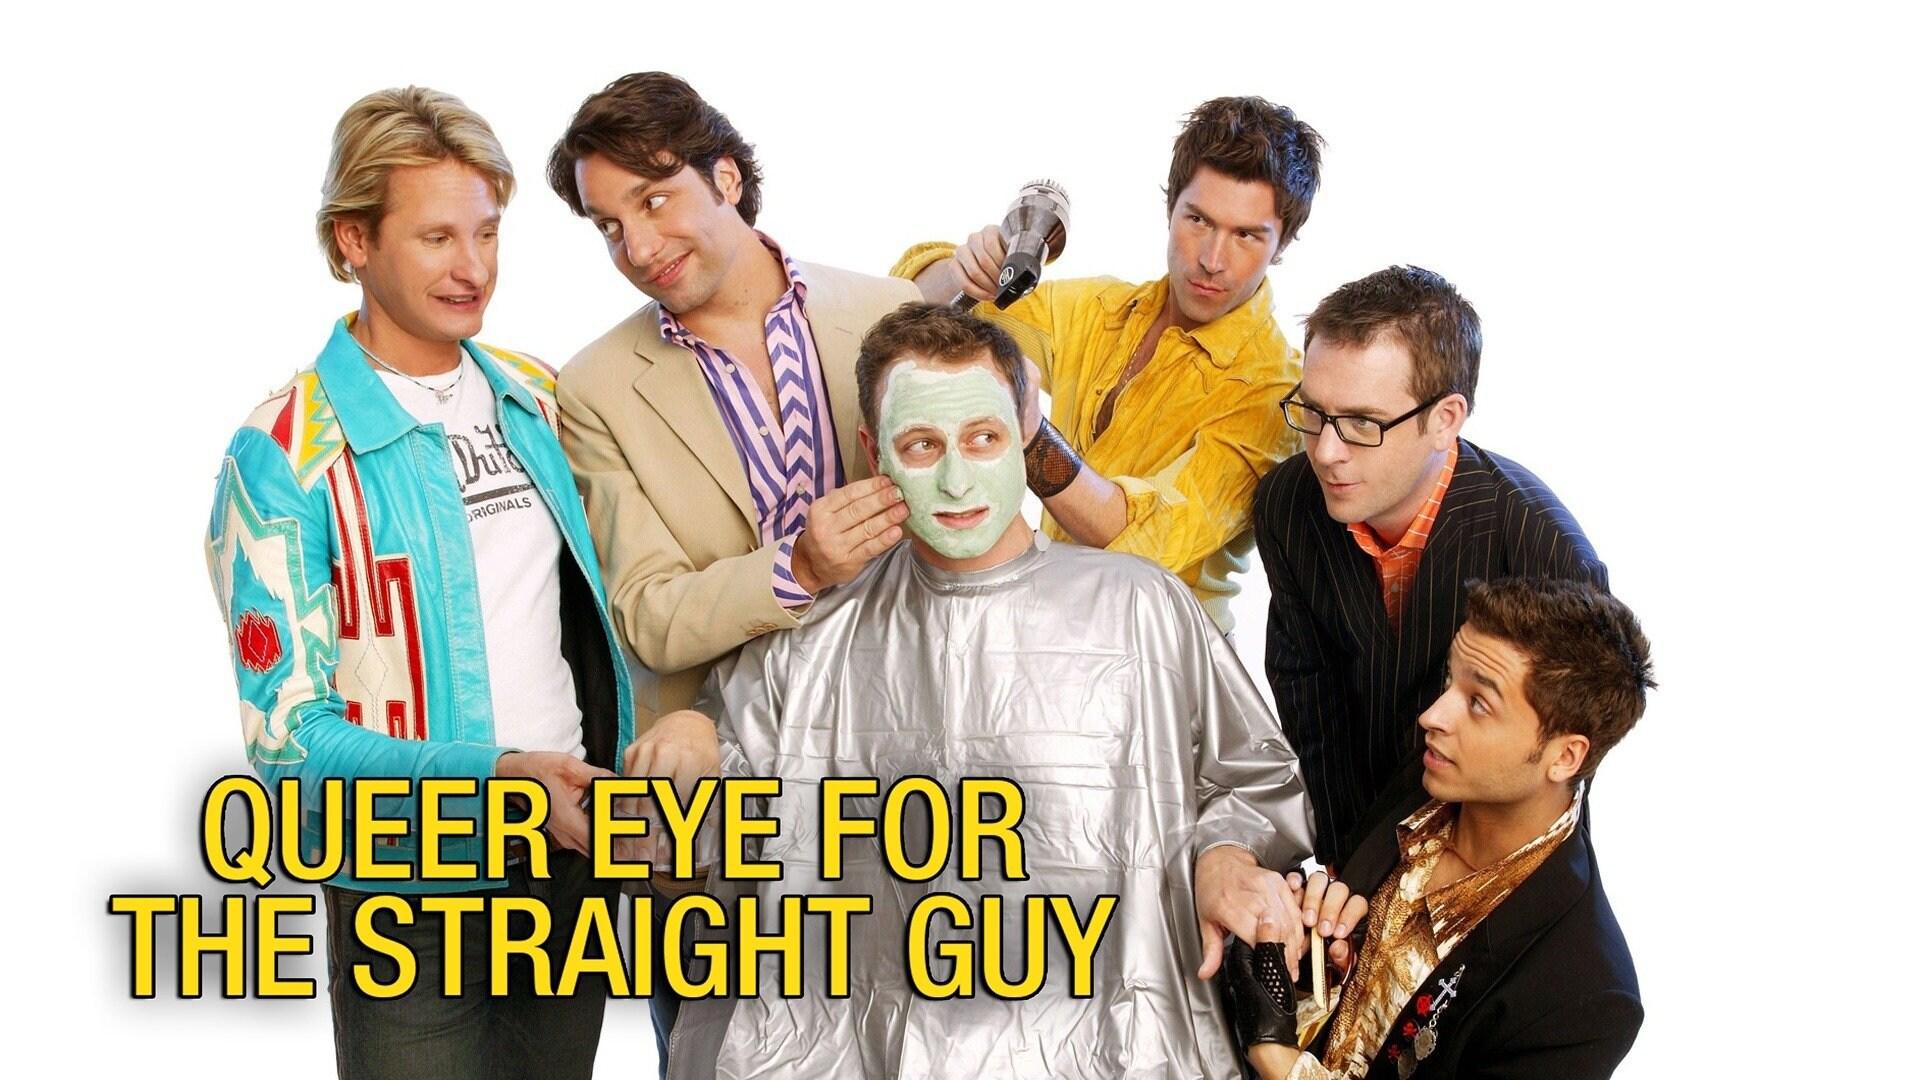 Queer Eye for the Not-So-Straight Guy: Wayne H.